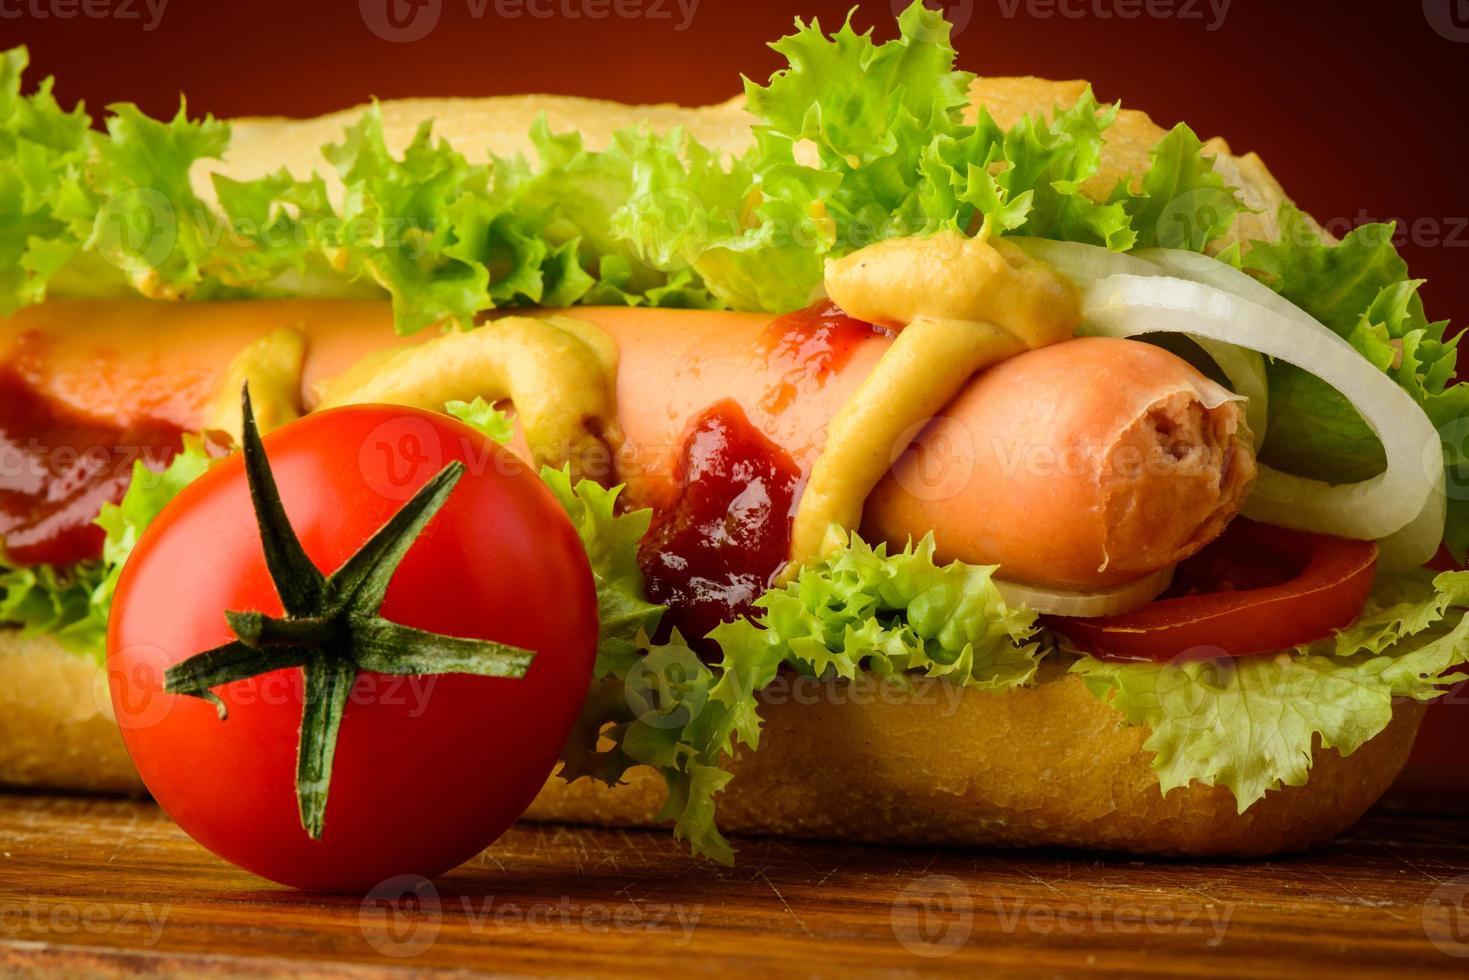 Hotdog closeup photo